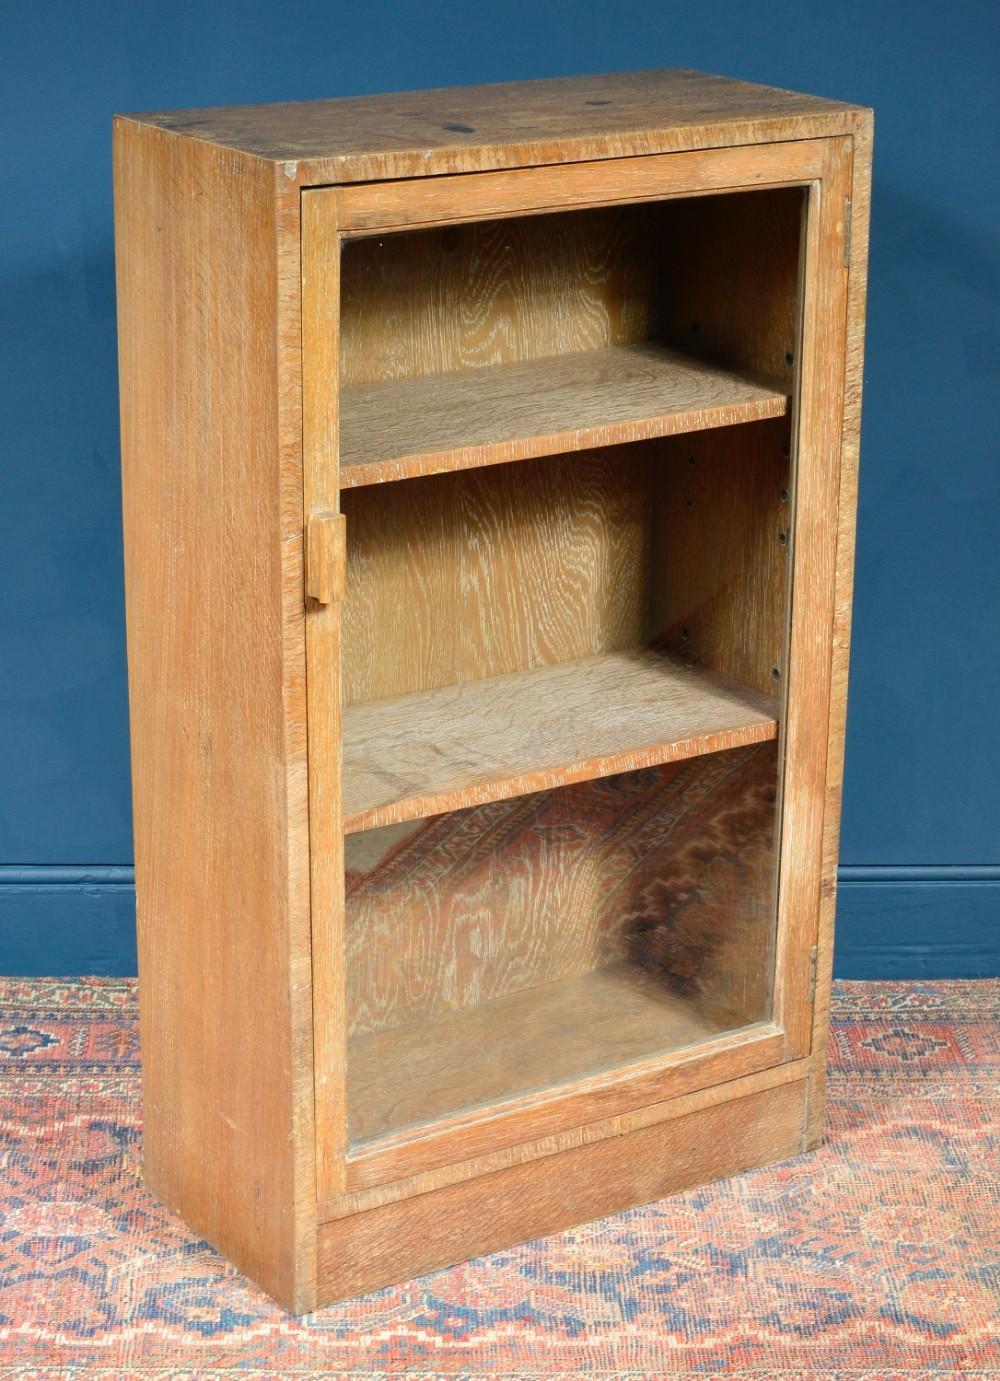 limed oak glazed bookcase cupboard in the manner of heal's 1930's